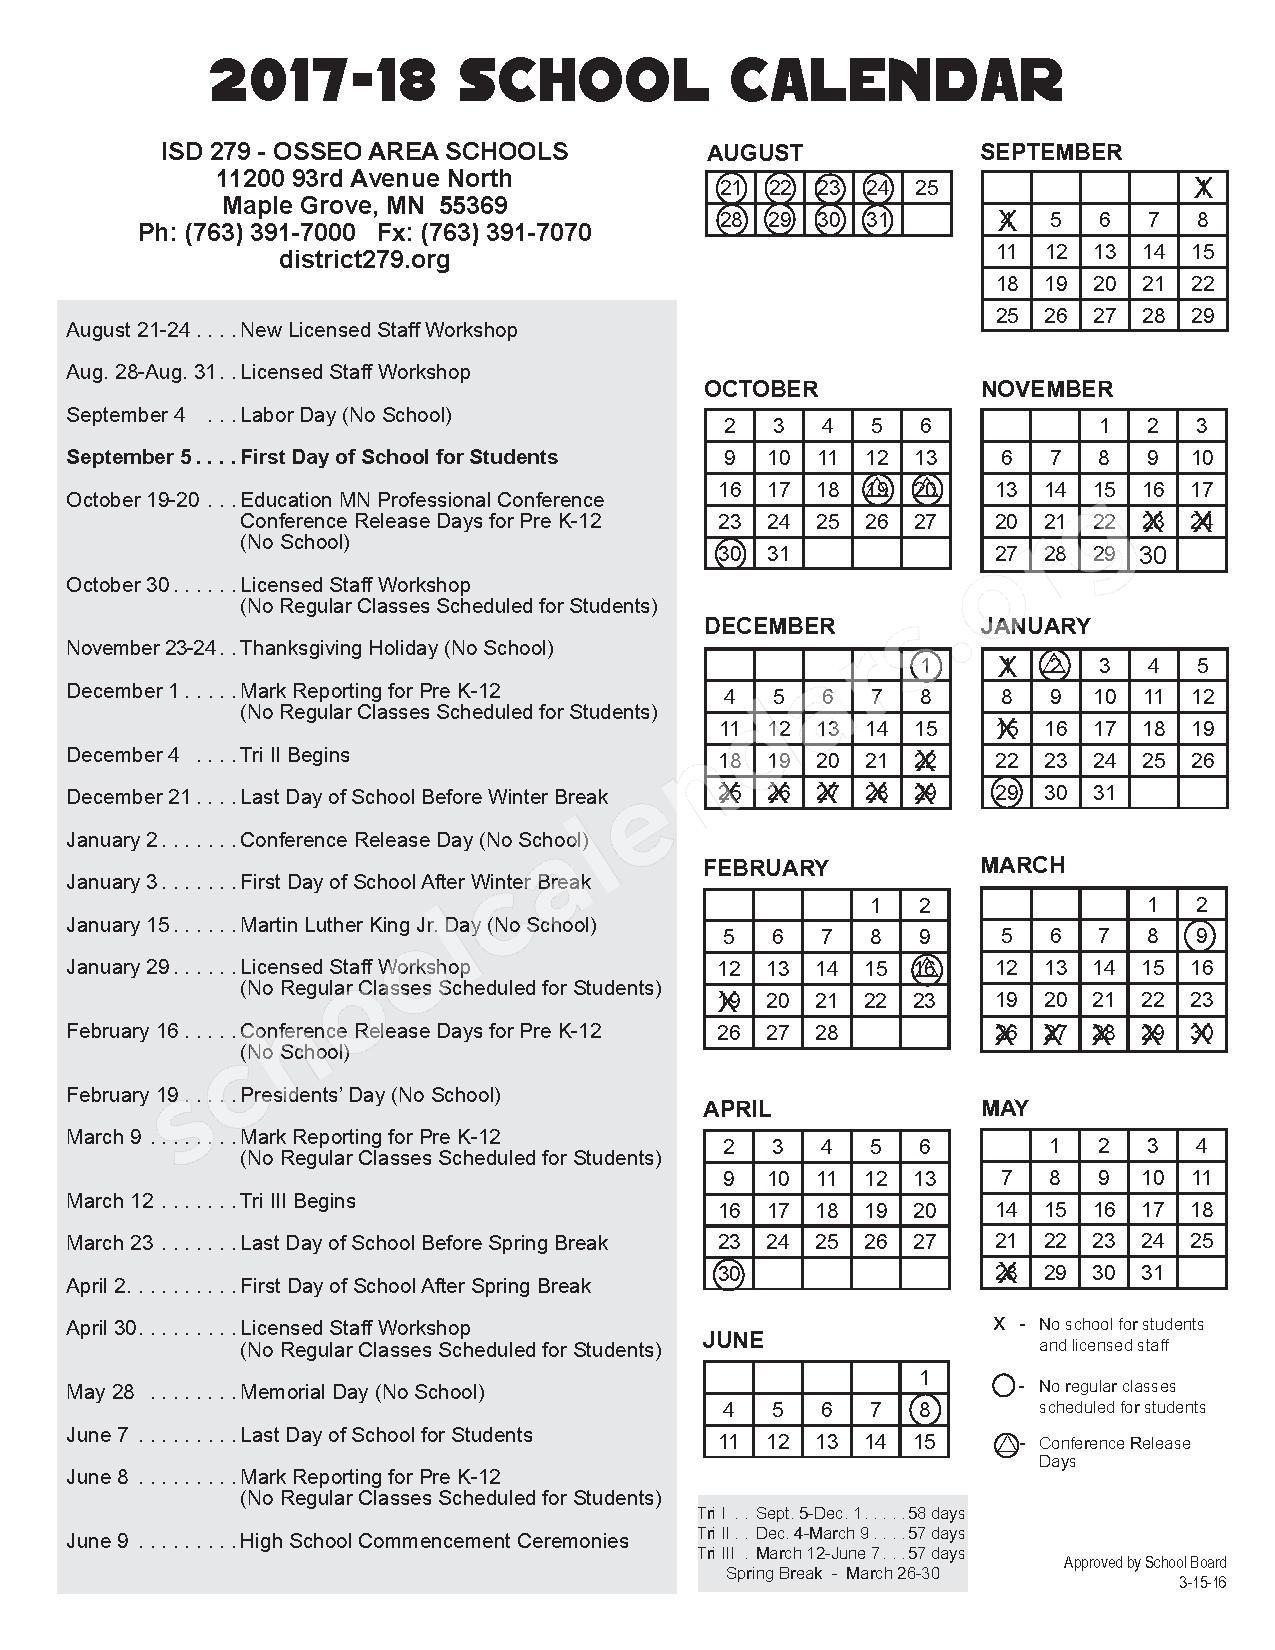 2017 - 2018 School Calendar – Osseo Public School District – page 1